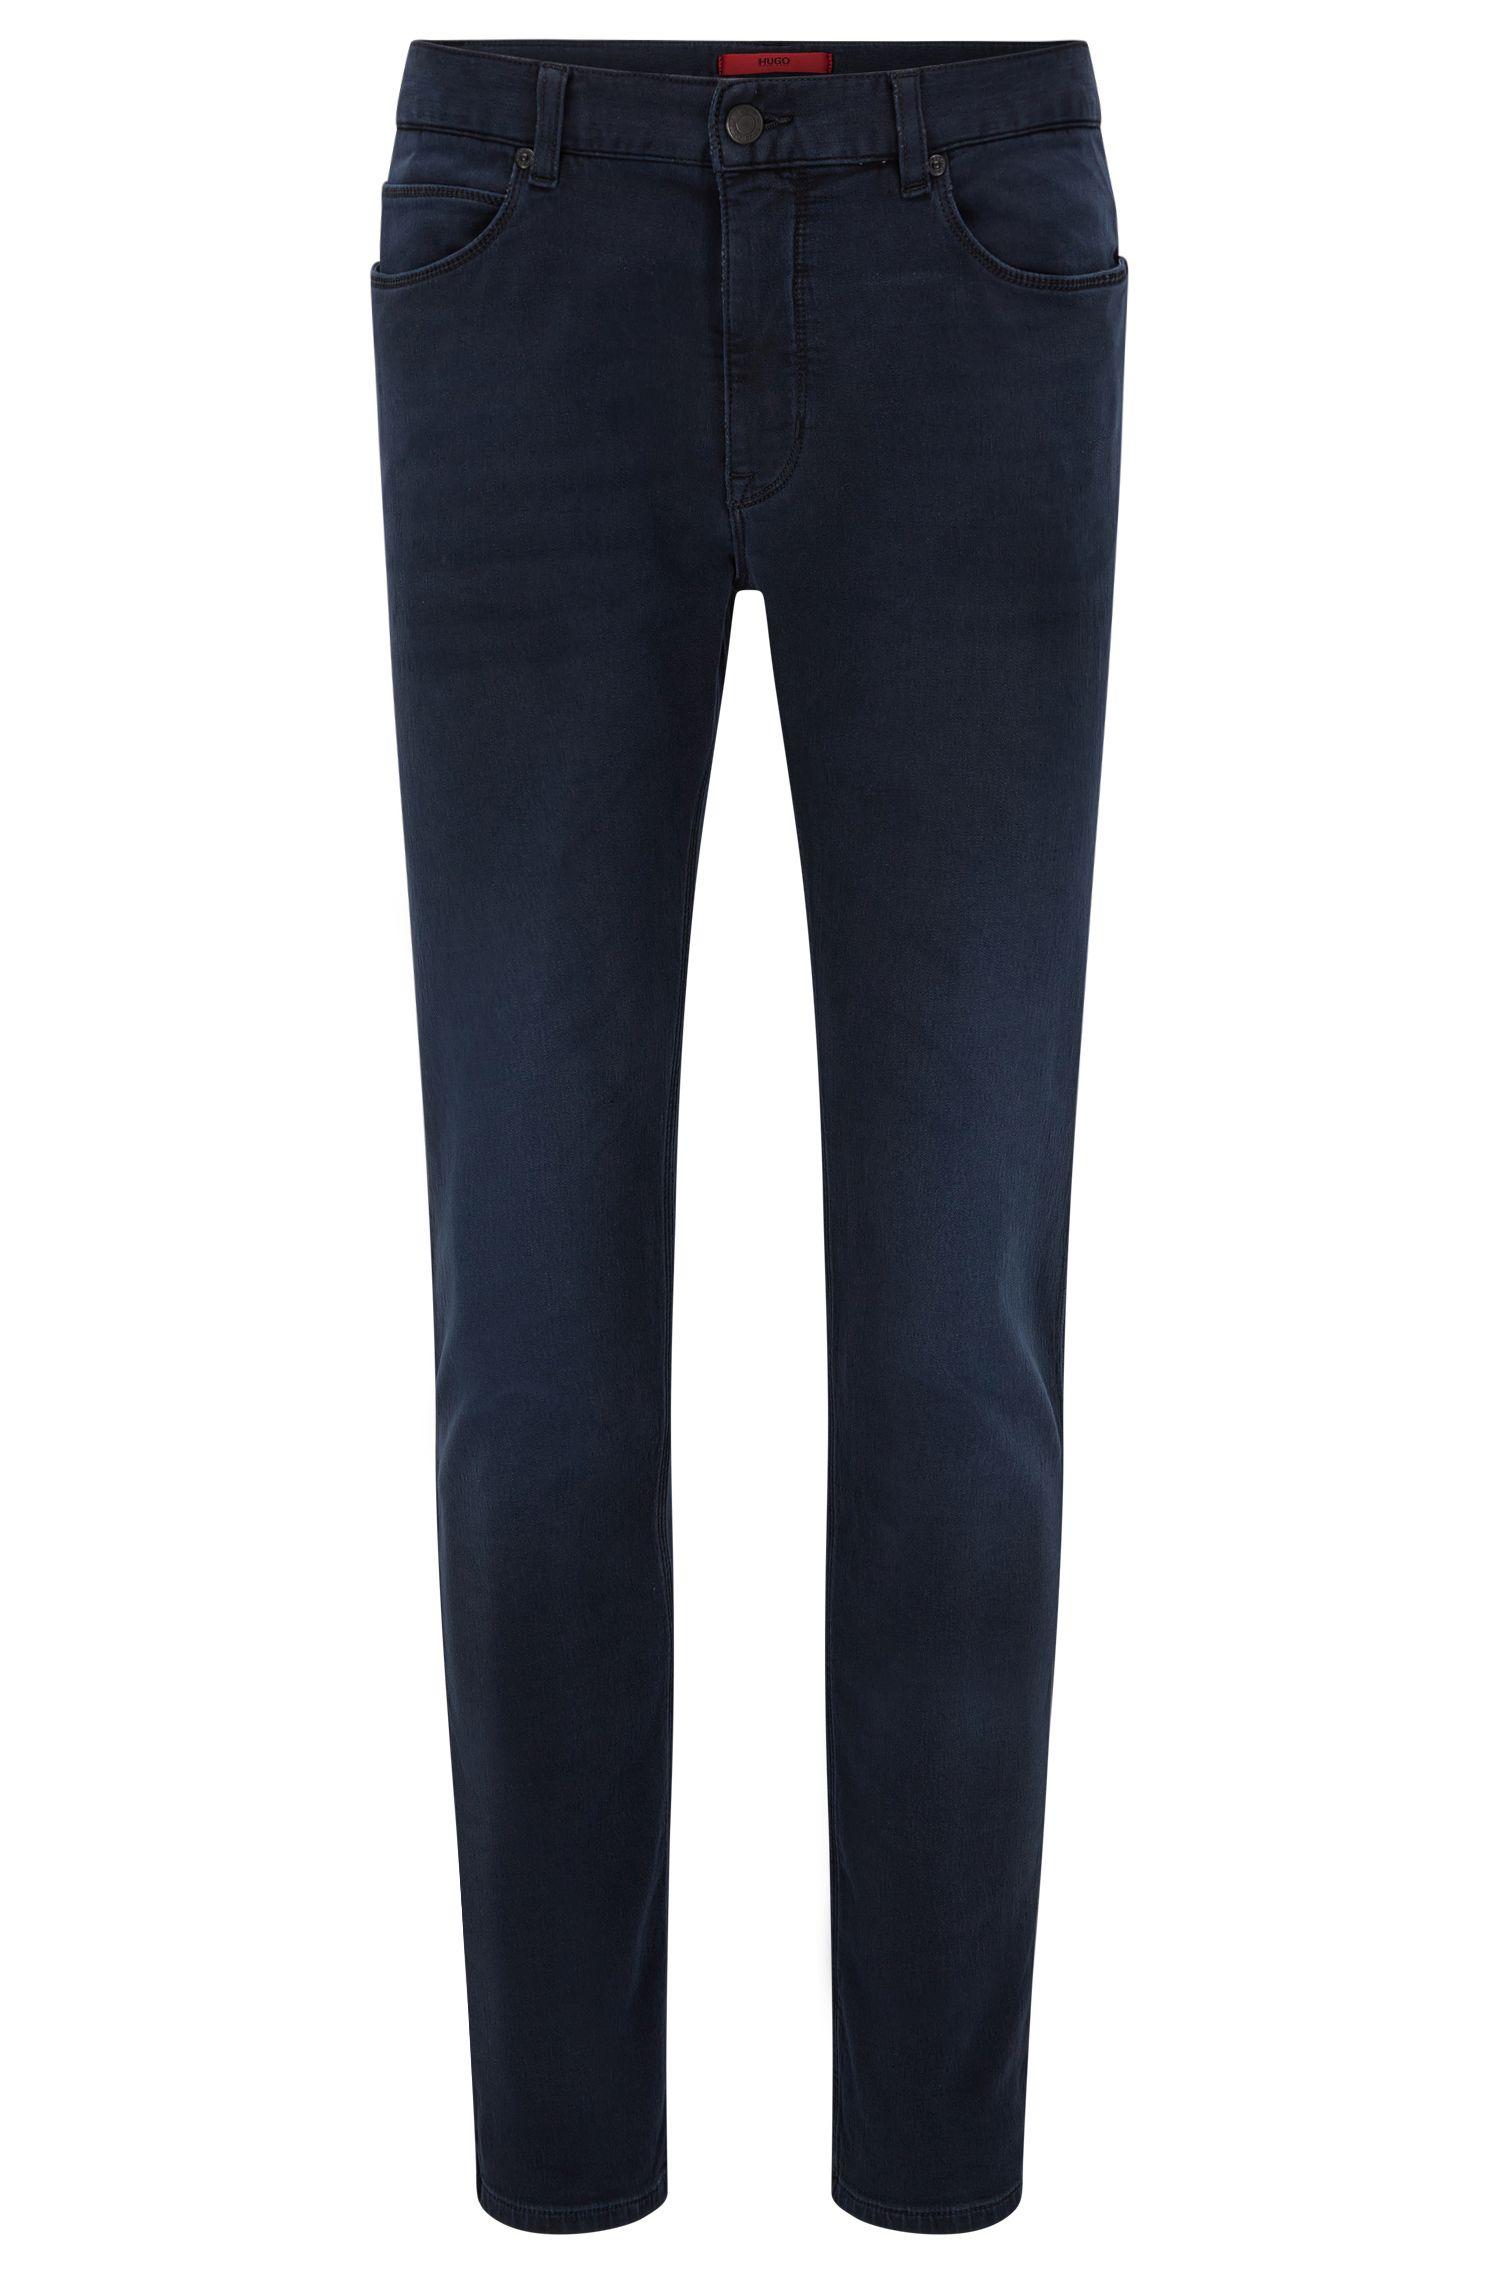 Skinny-Fit Jeans aus Stretch-Baumwolle